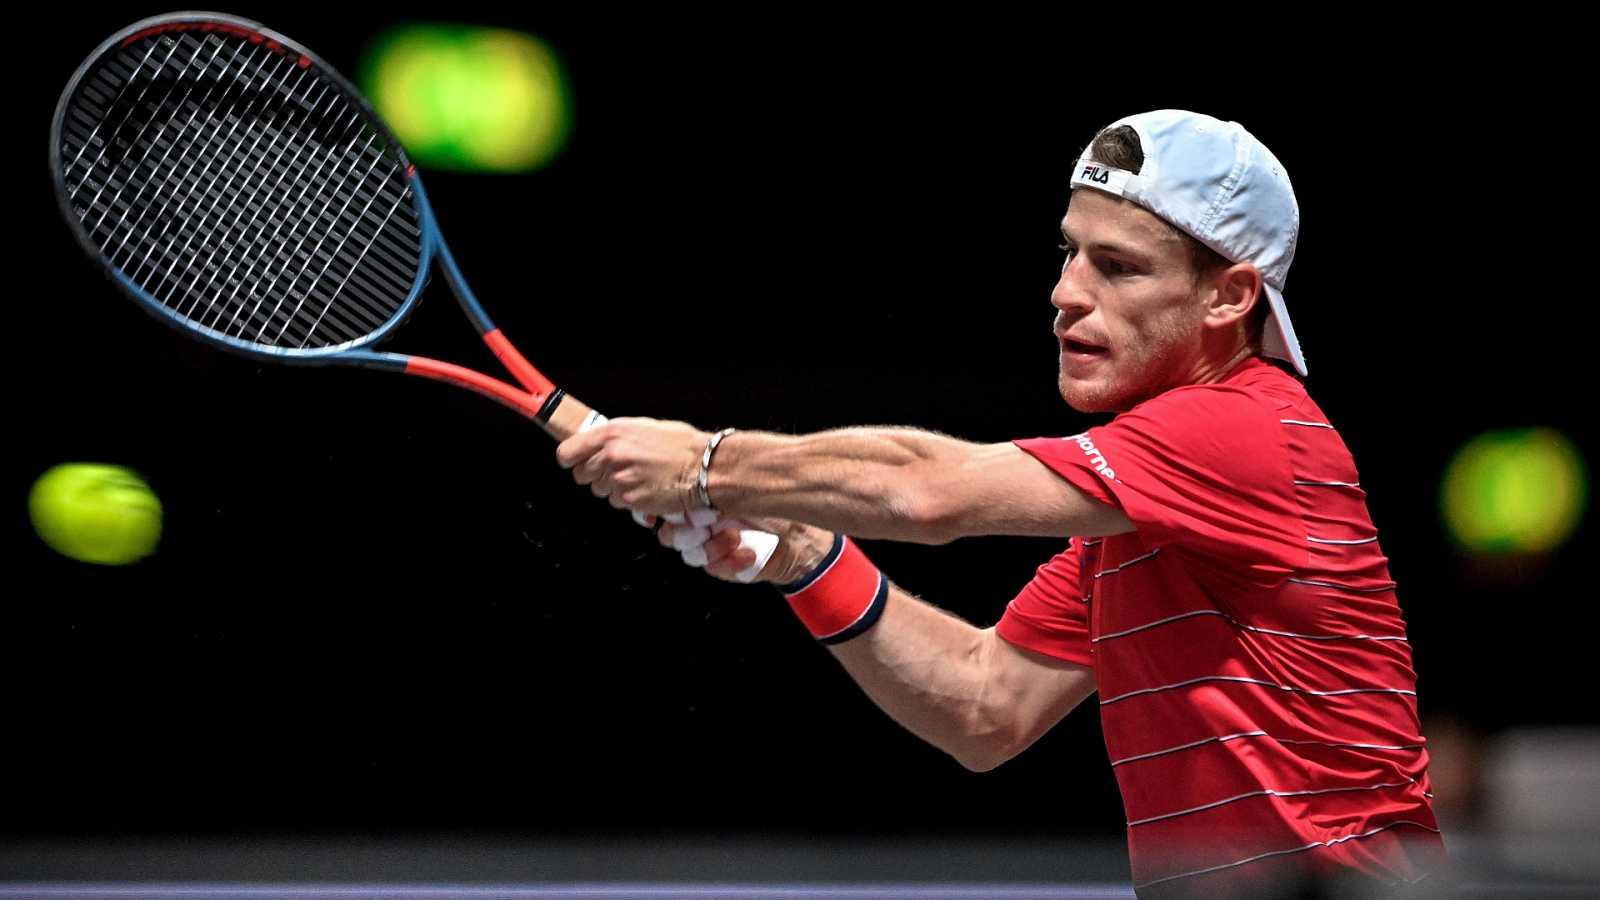 Tenis - ATP 250 Torneo Colonia (II). Semifinal: Felix Auger-Aliassime - Diego Schwartzman - ver ahora